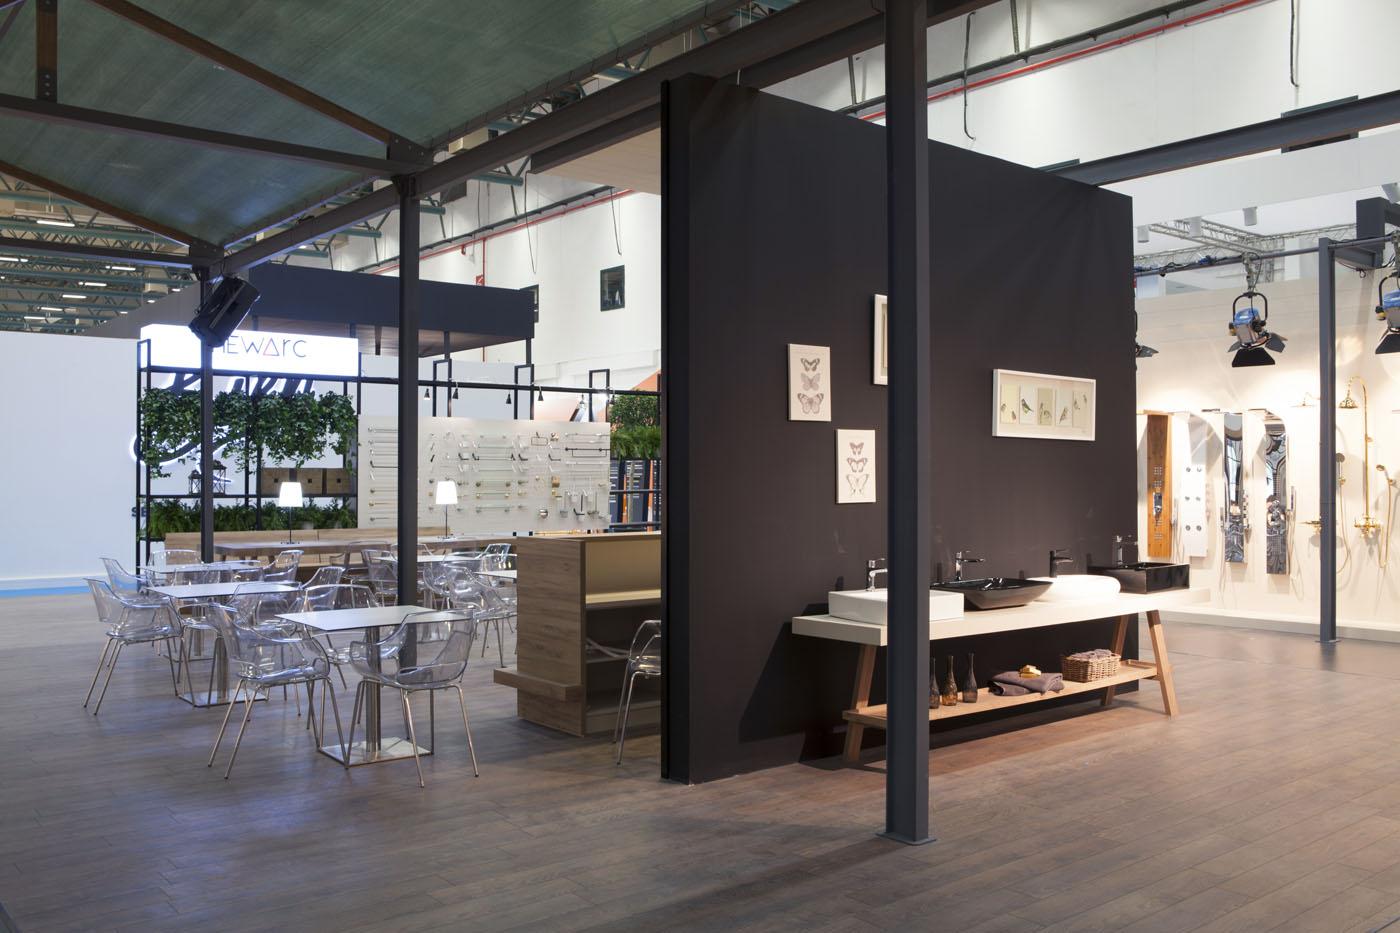 Design office fuar tasarimi newarc unicera 2014 43 1 for Office design 2014